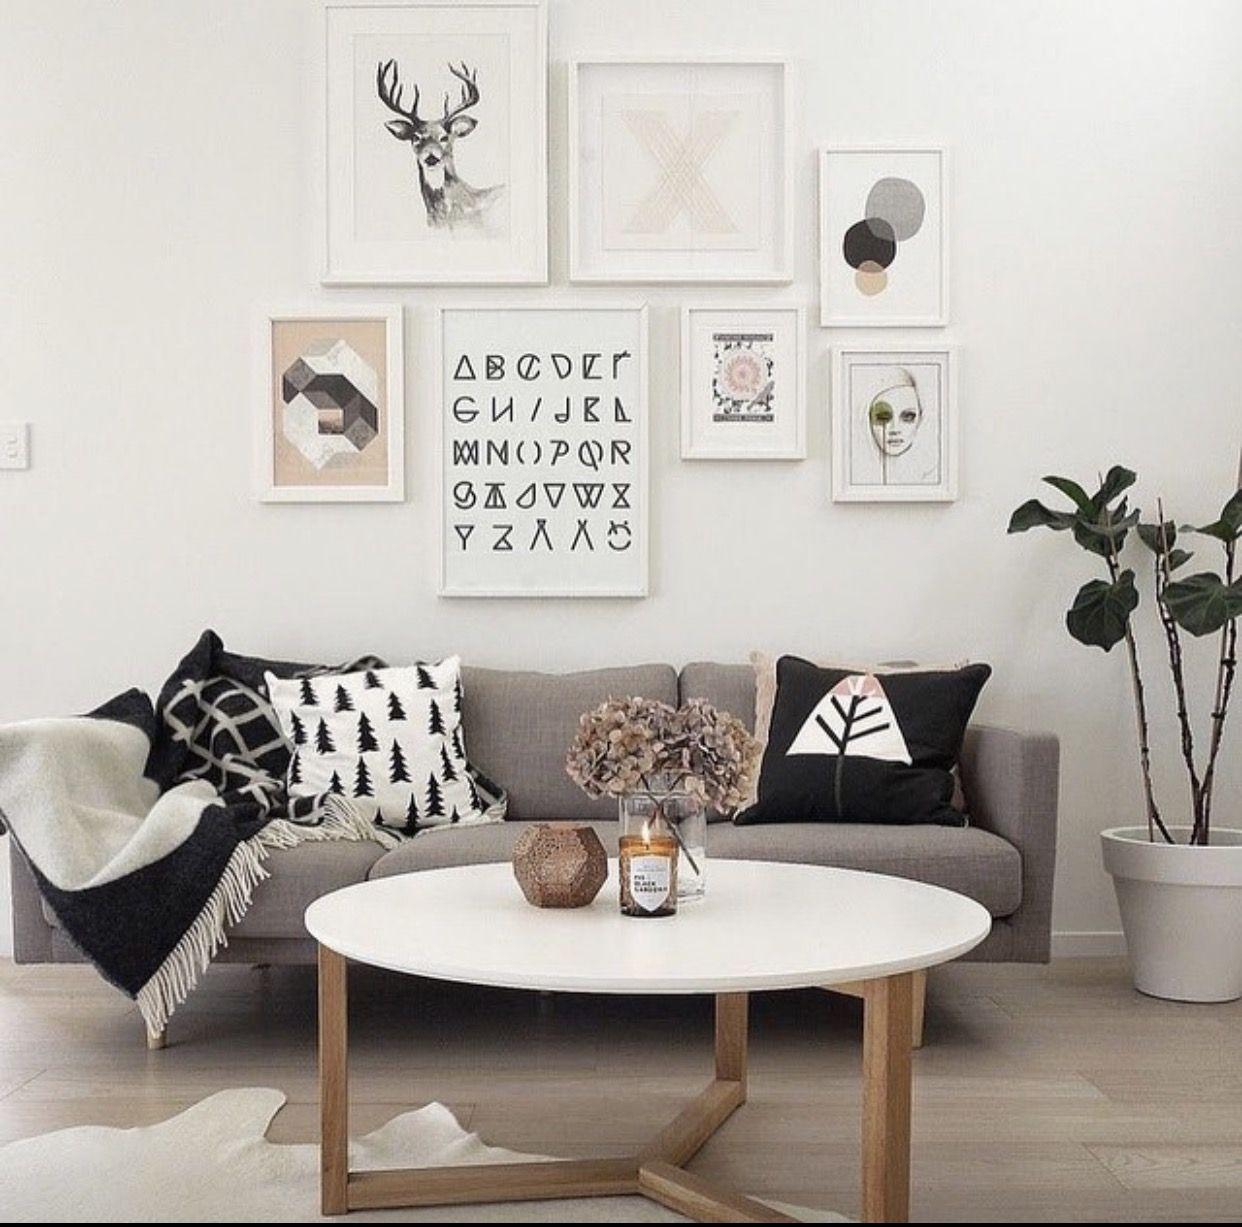 Pin De Ammie En Home Pinterest Cuadro ~ Pinterest Decoracion De Interiores